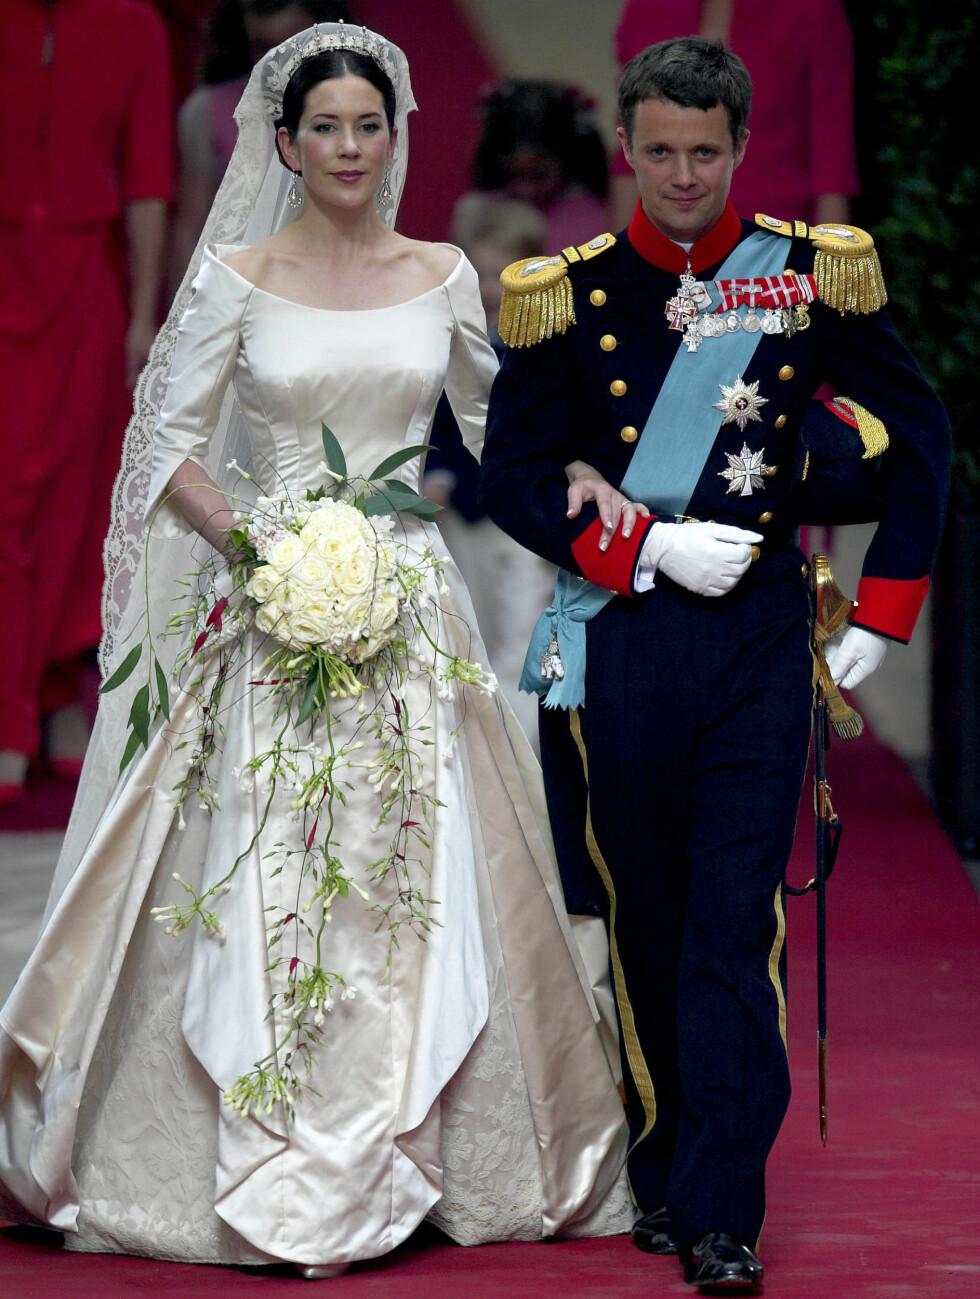 DANSK DESIGN: Mary valgte kjole fra danske Uffe Frank da hun giftet seg med kronprins Frederik. Foto: Stella Pictures